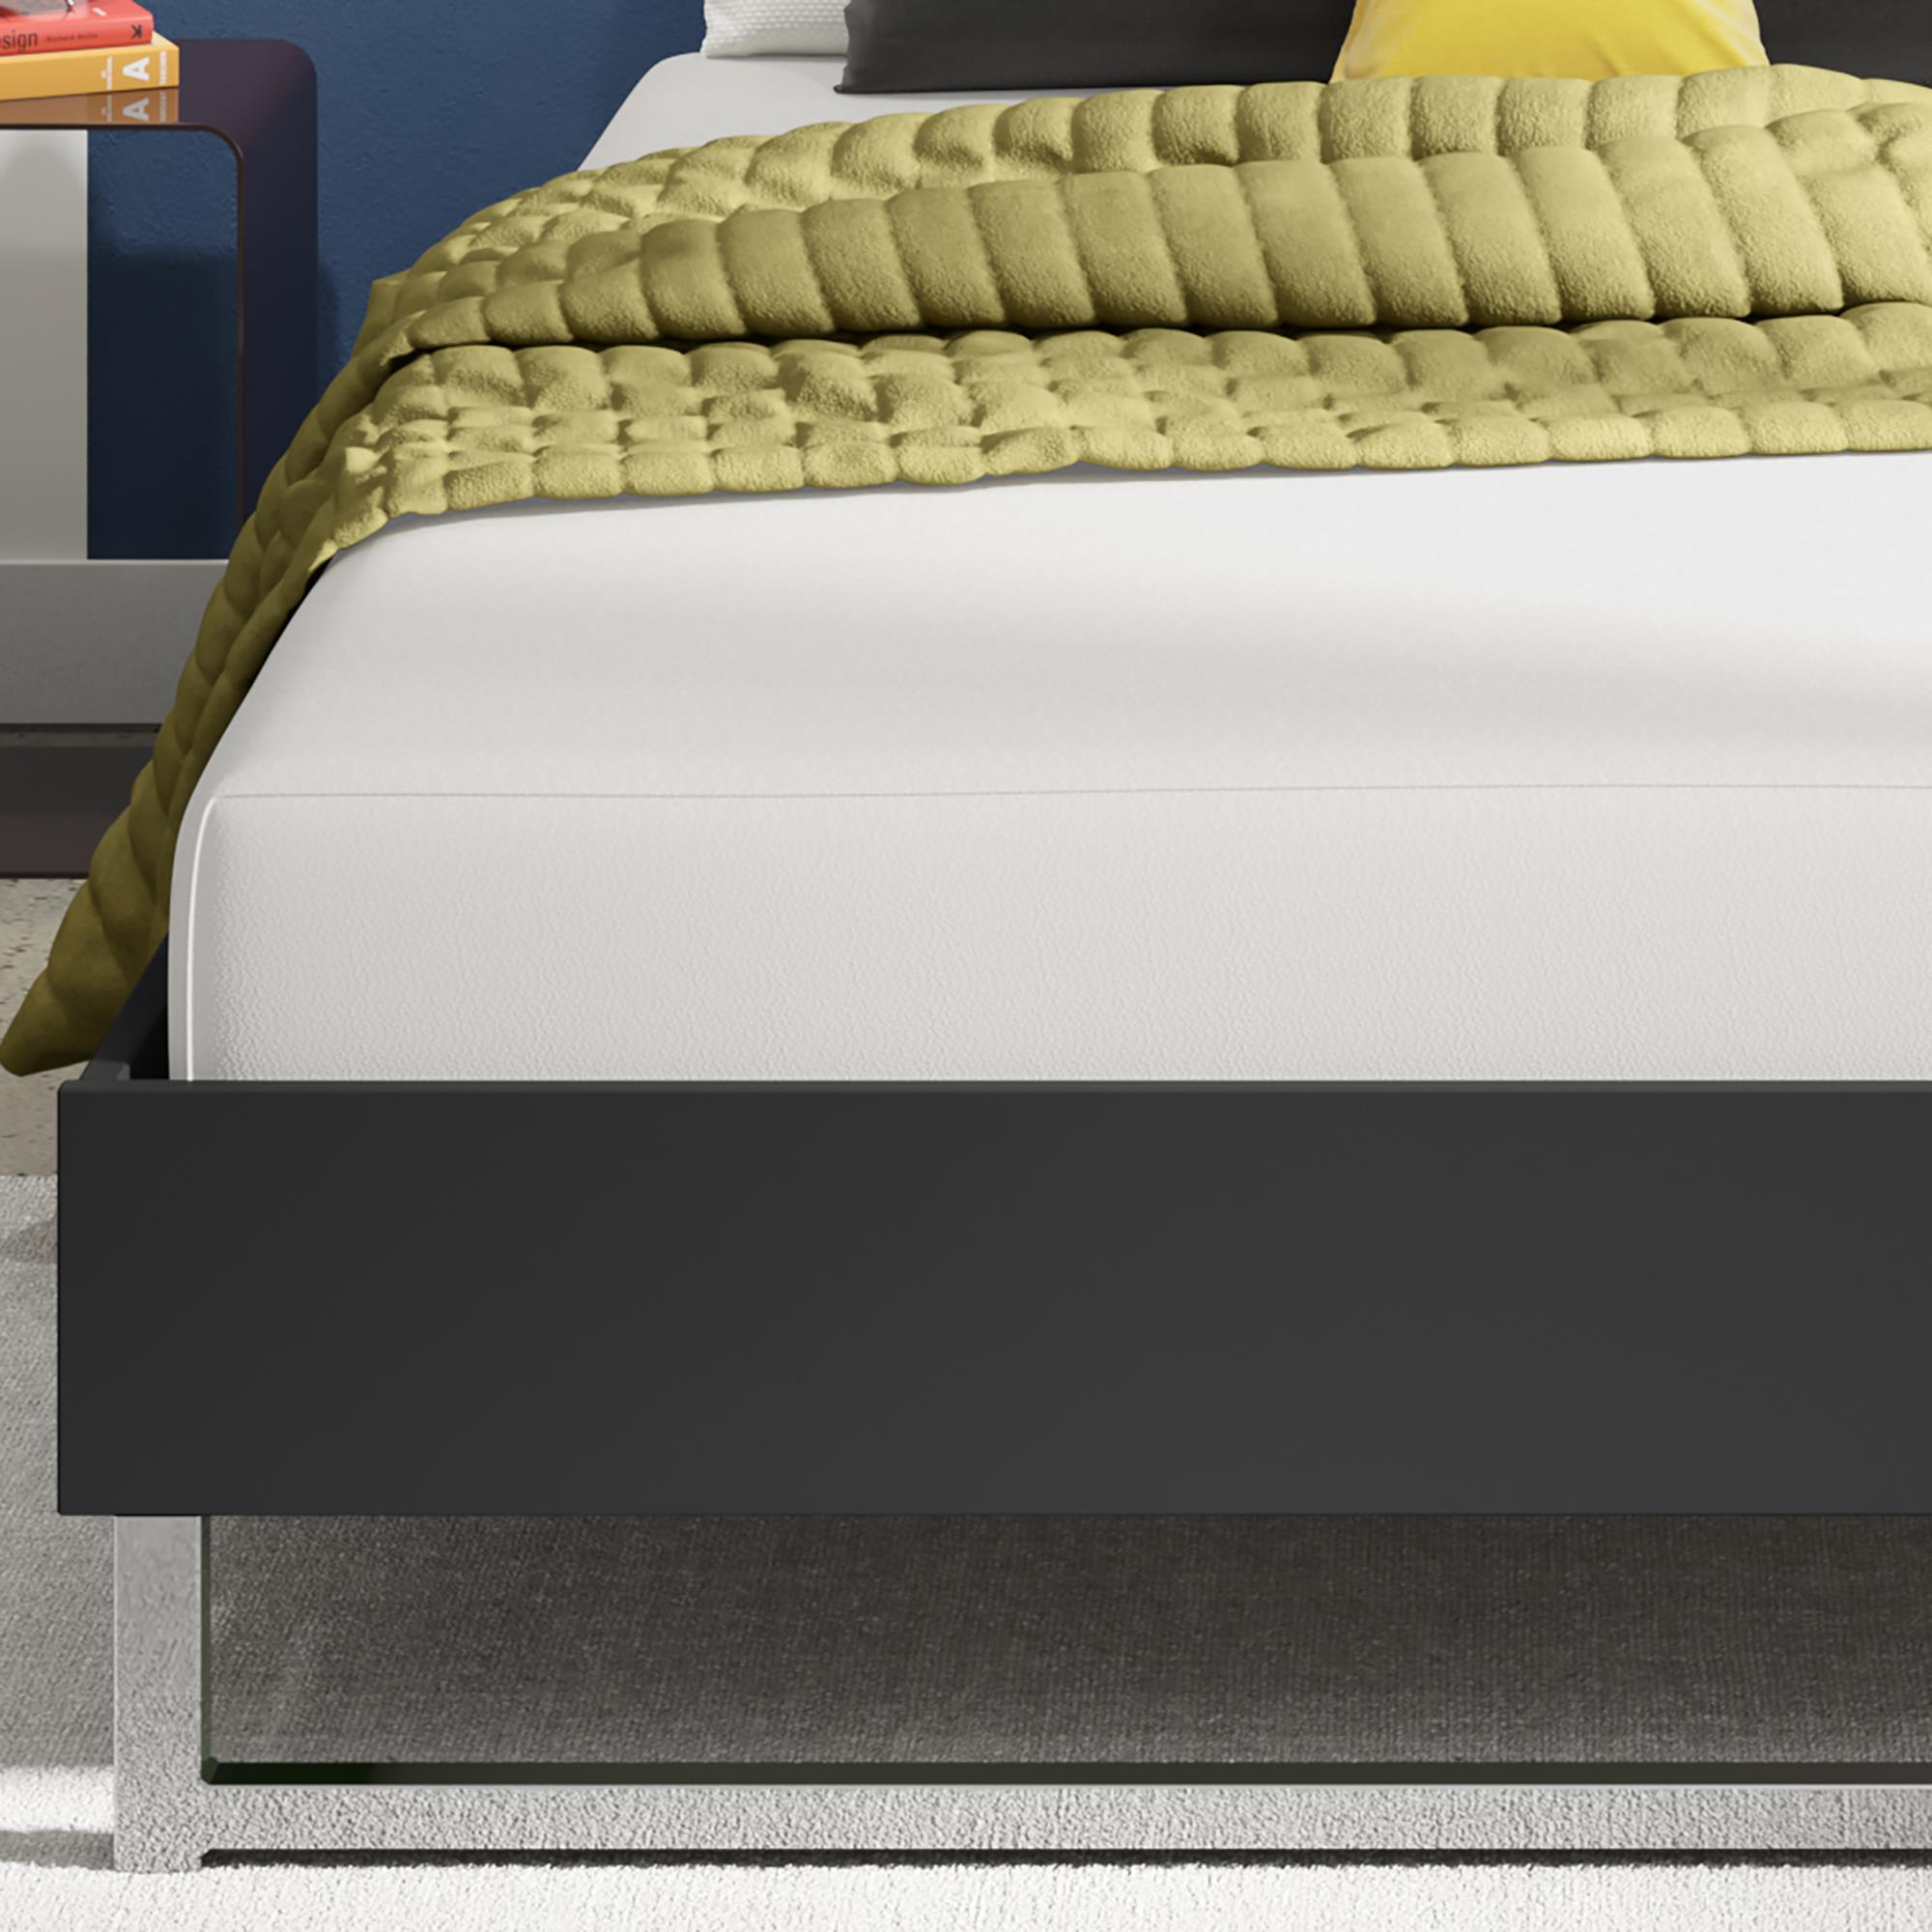 Signature Sleep Memoir 8 inch Memory Foam Mattress, Multiple Sizes